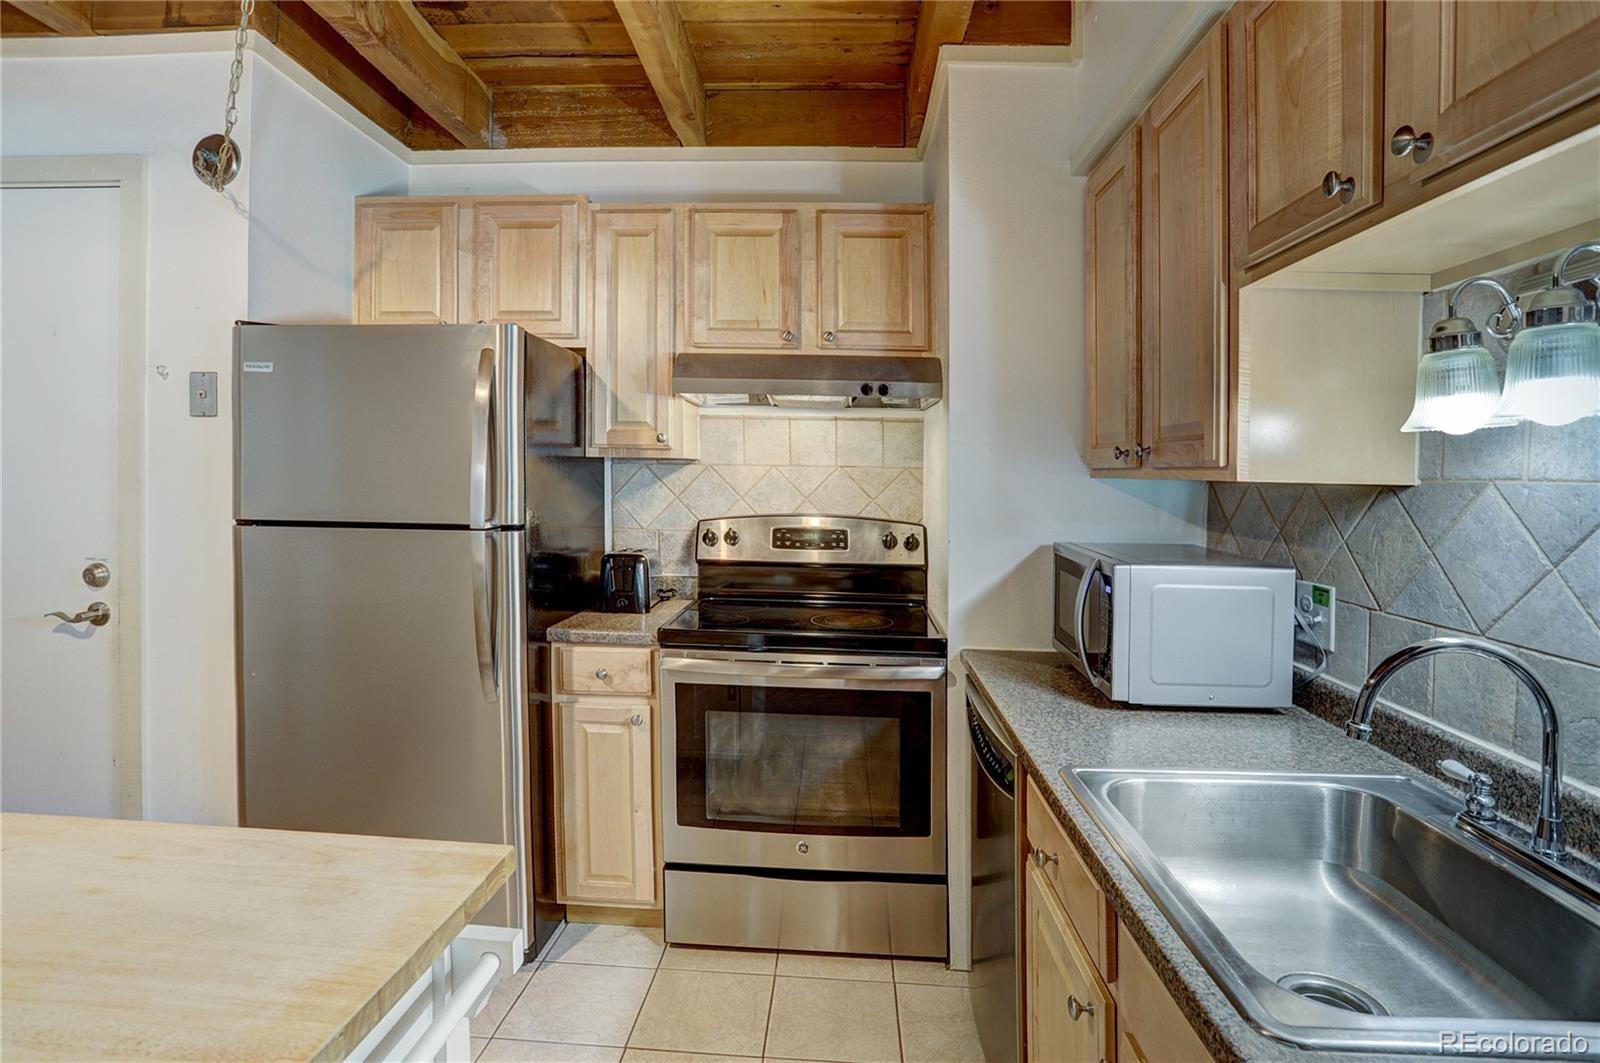 MLS# 3104503 - 11 - 2400 Lodge Pole Circle #206, Silverthorne, CO 80498